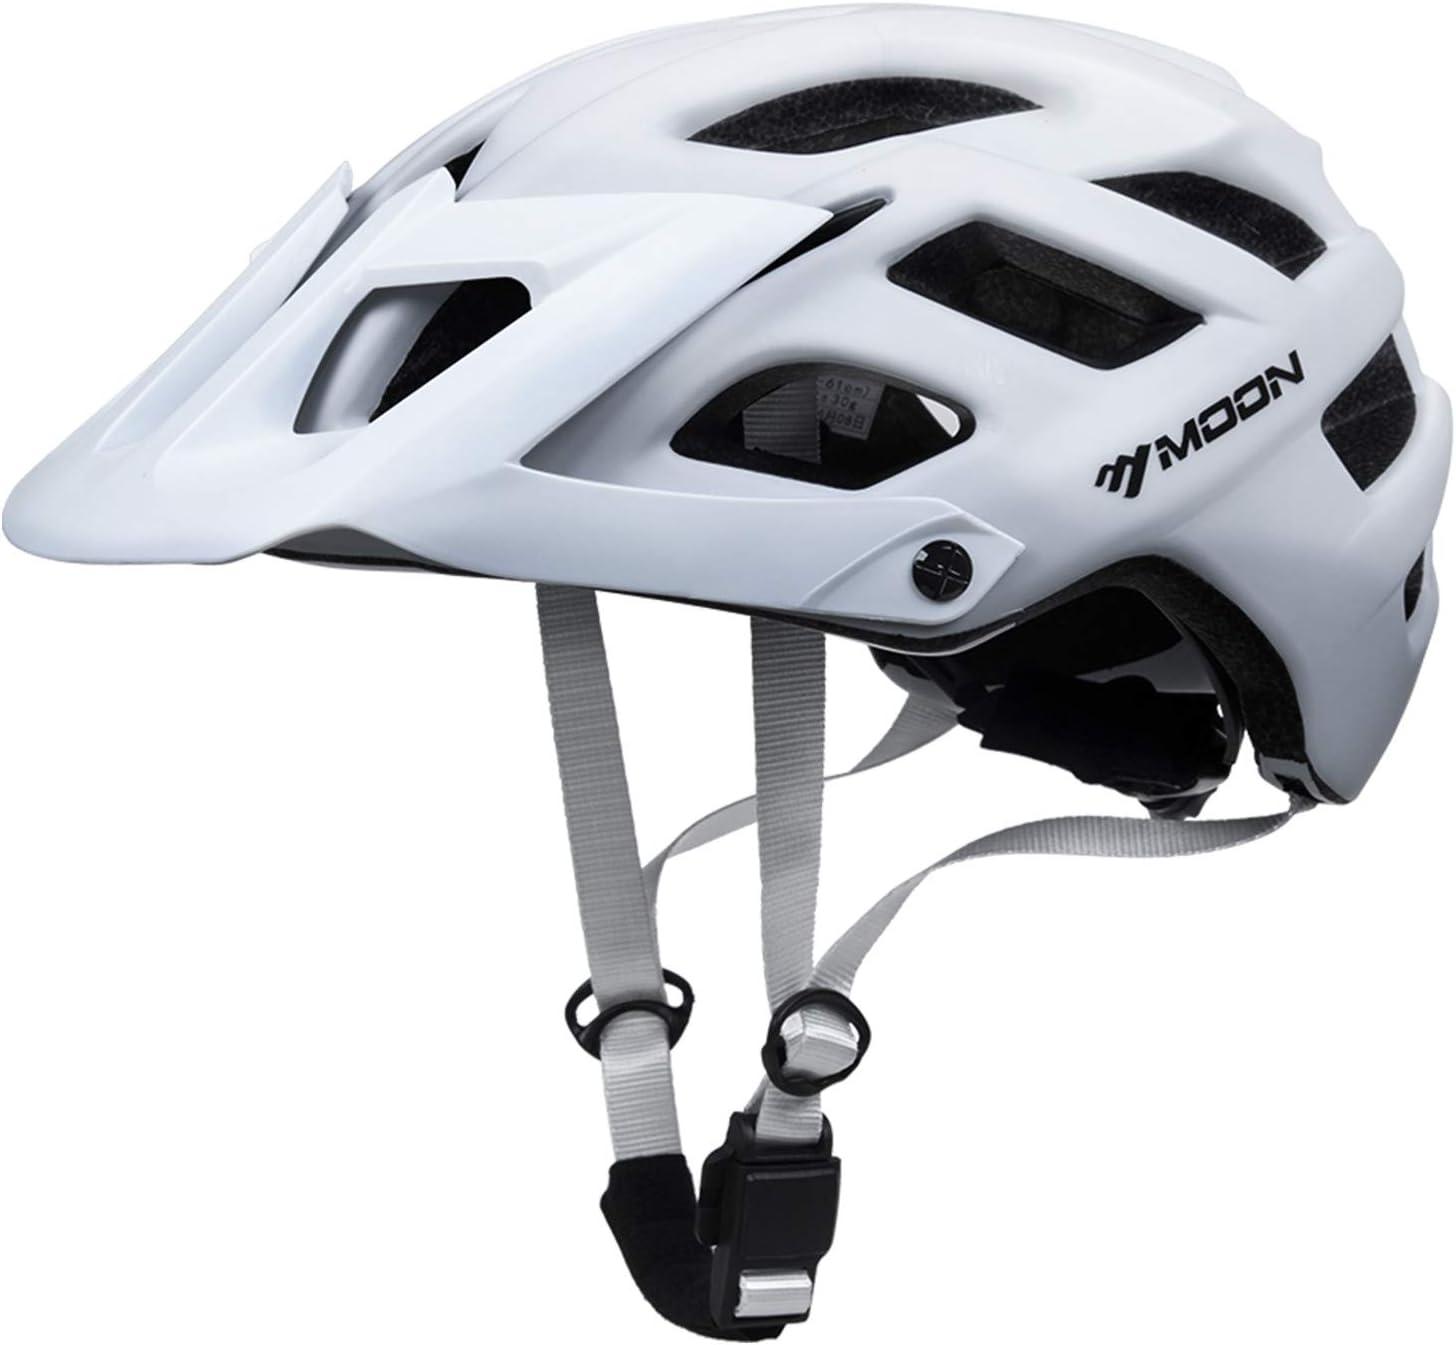 MOON Adult Bicycle Helmet $16.19 Coupon